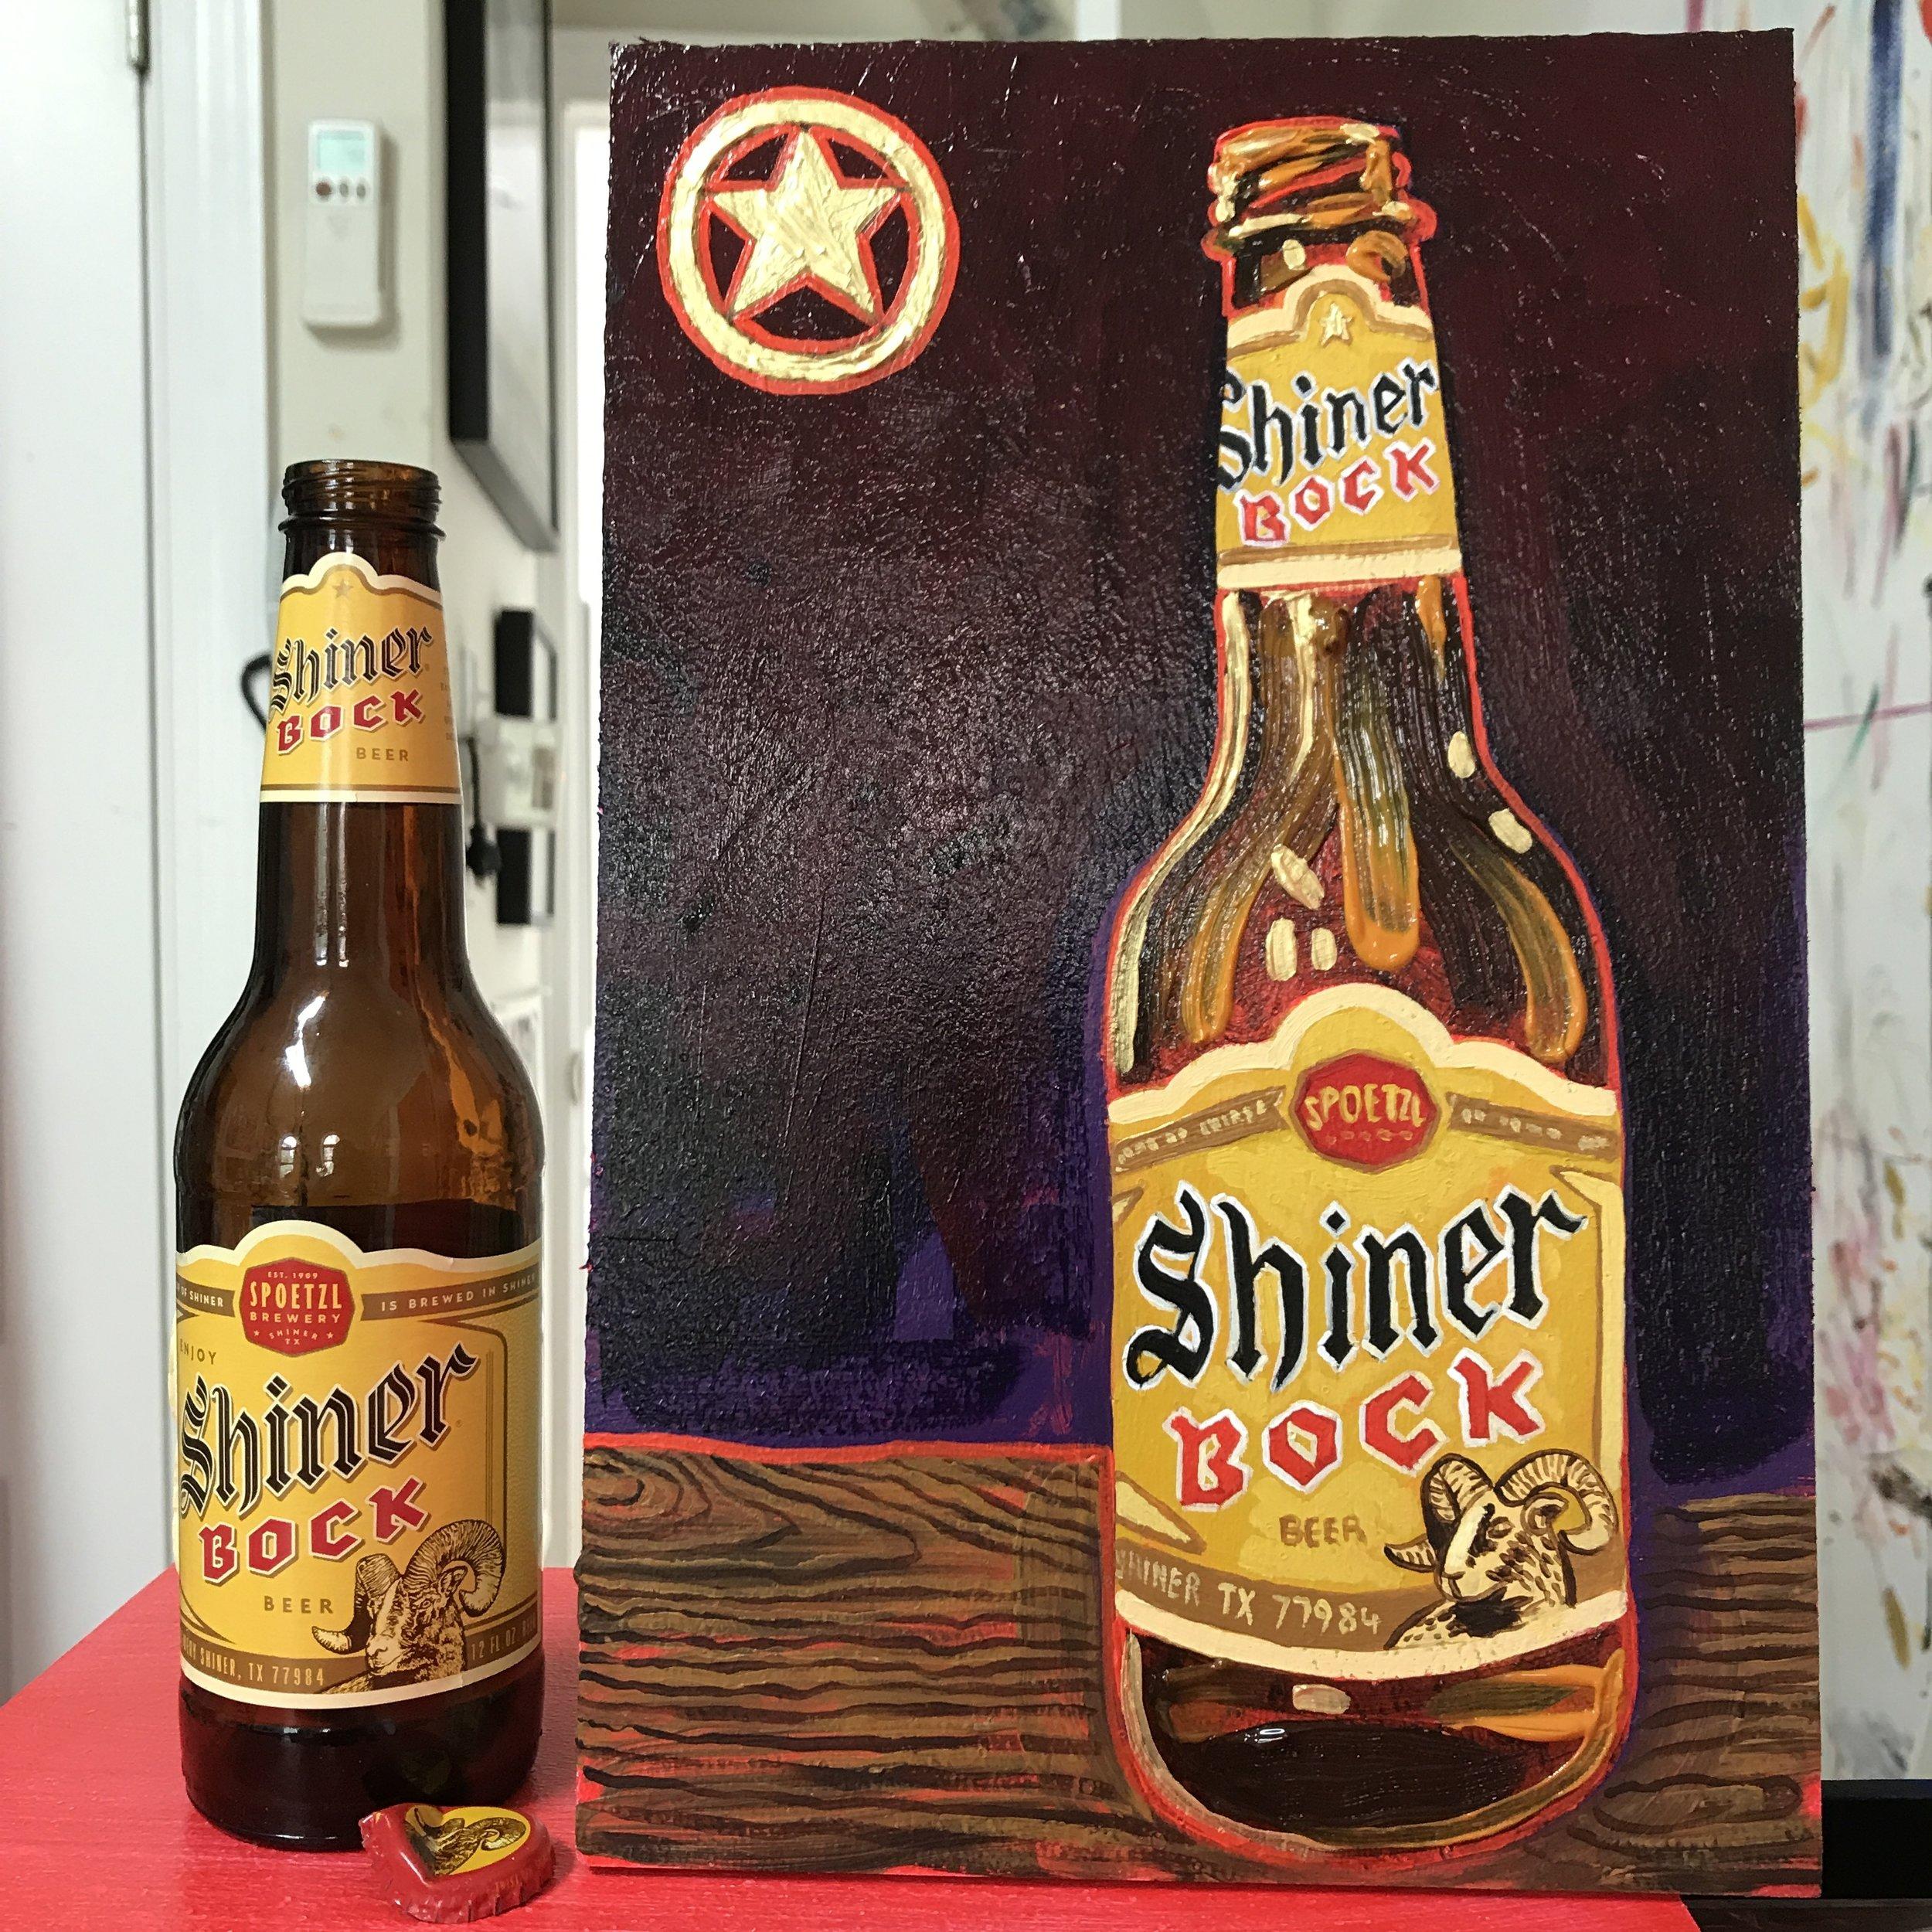 78 Shiner Bock (USA)